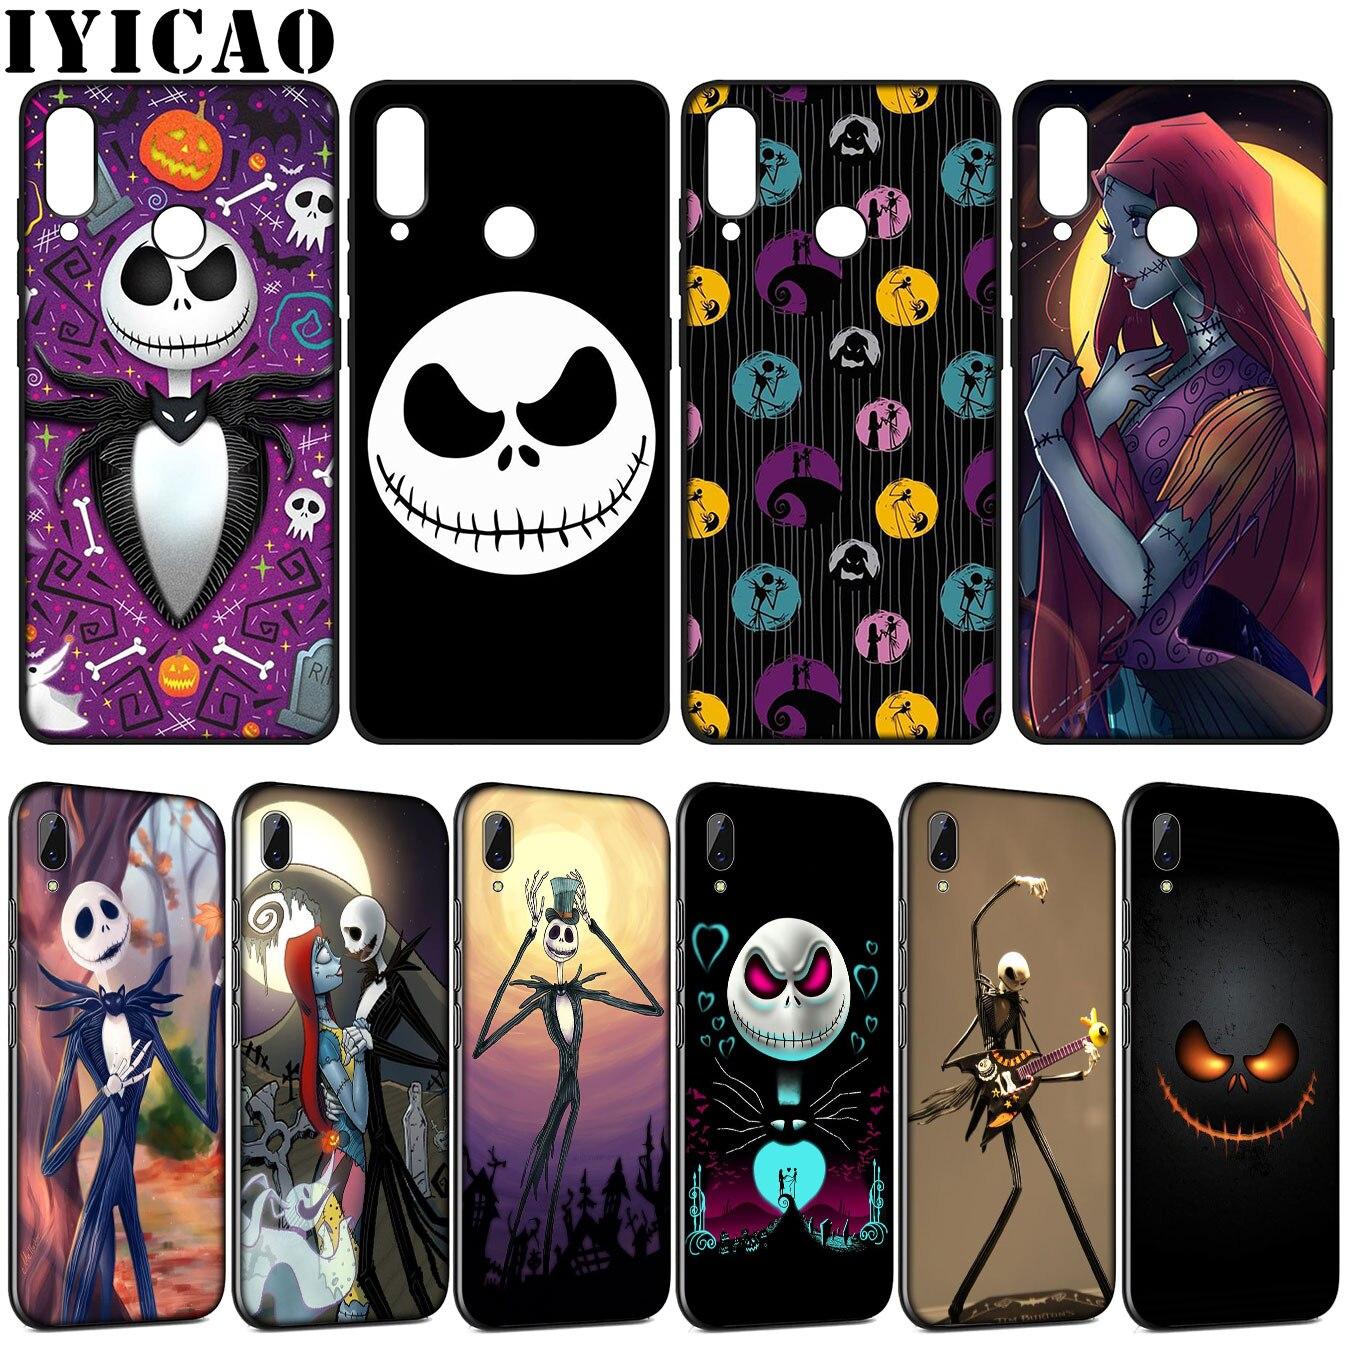 IYICAO Jack Sally Nightmare ソフトシリコンケース Huawei 社 Y9 Y7 Y6 プライム 2019 名誉 20 10 9 9X 8C 8 × 8 Lite 7C 7X 7A プロ